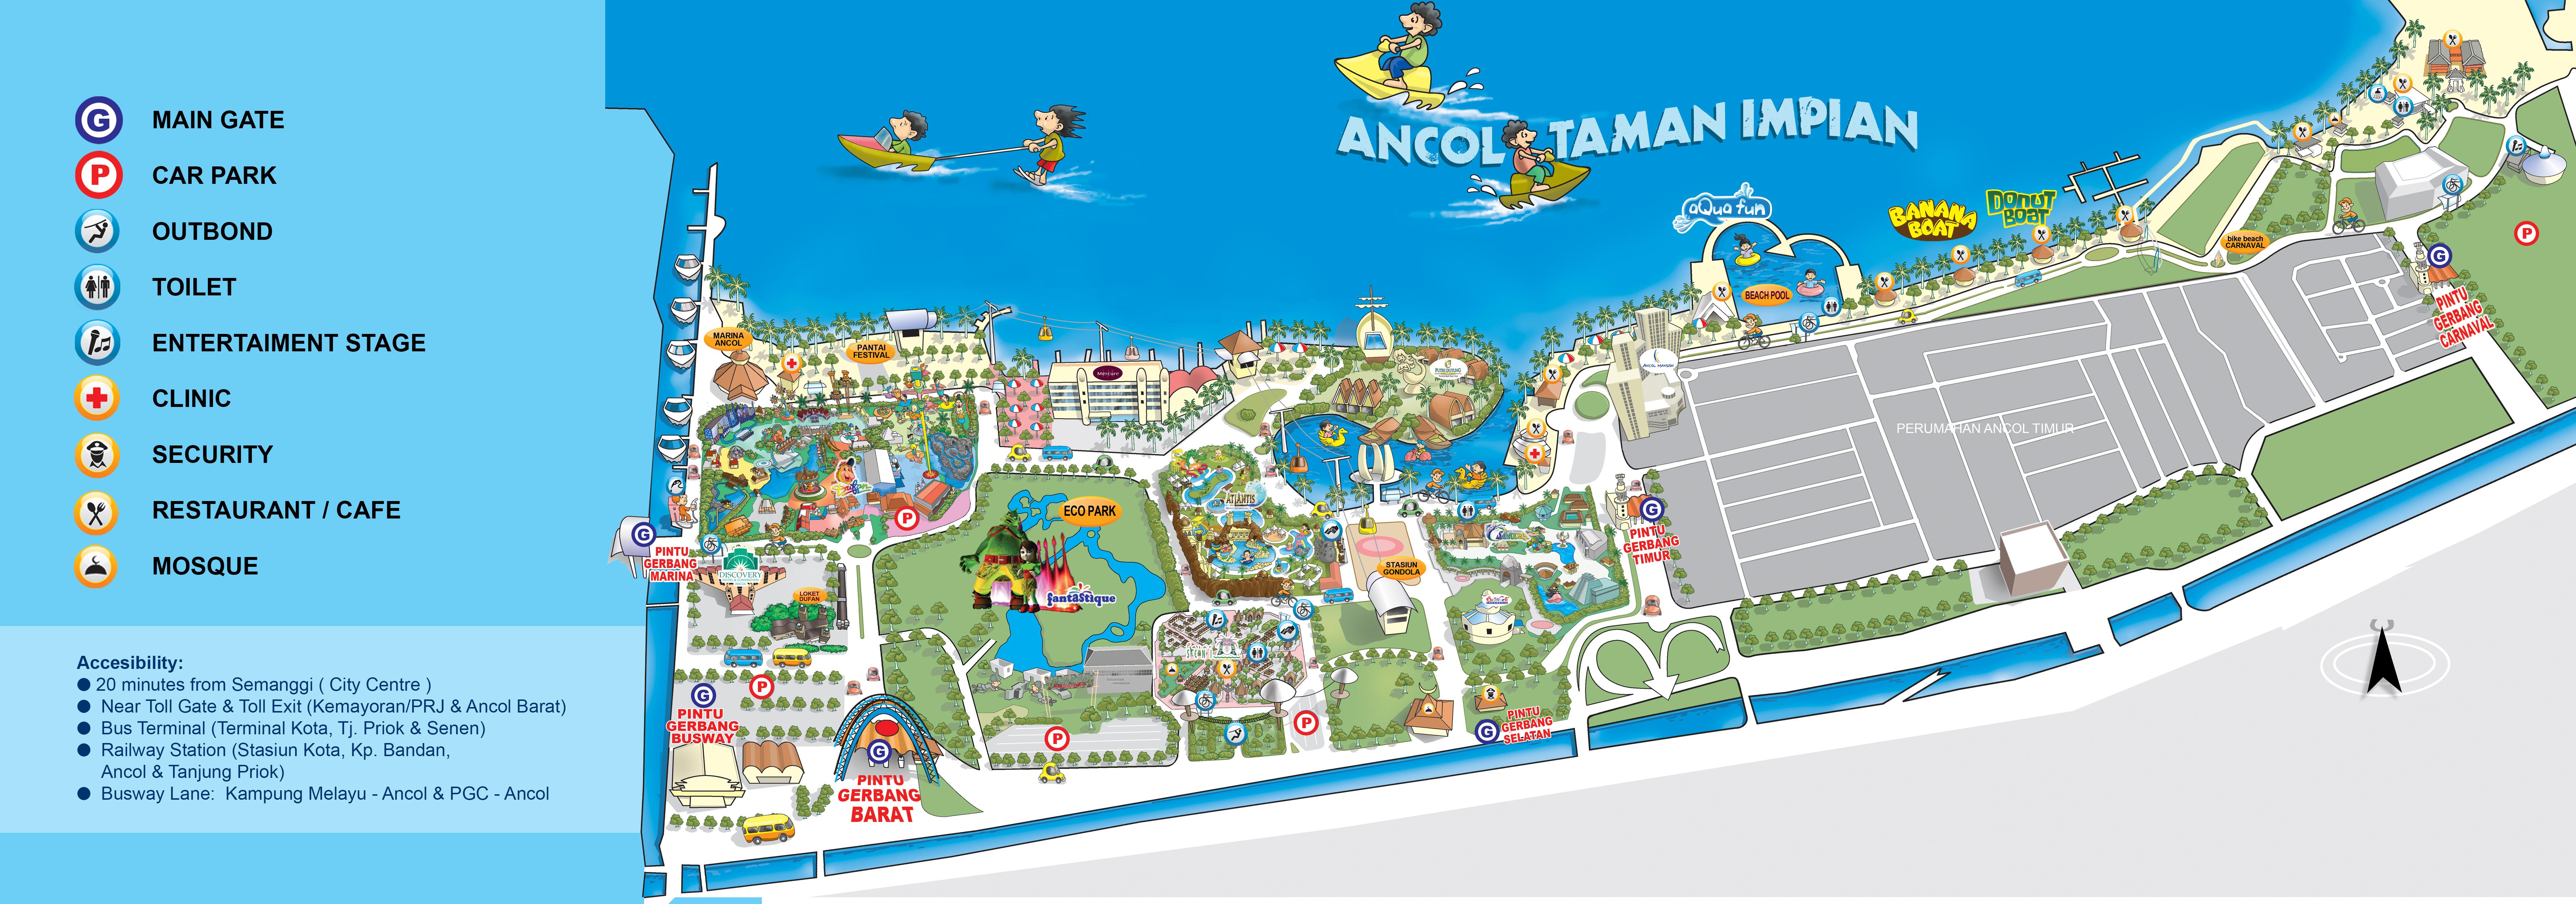 Peta Jpg Sign Petualangan Air Atlantis Kota Administrasi Jakarta Utara